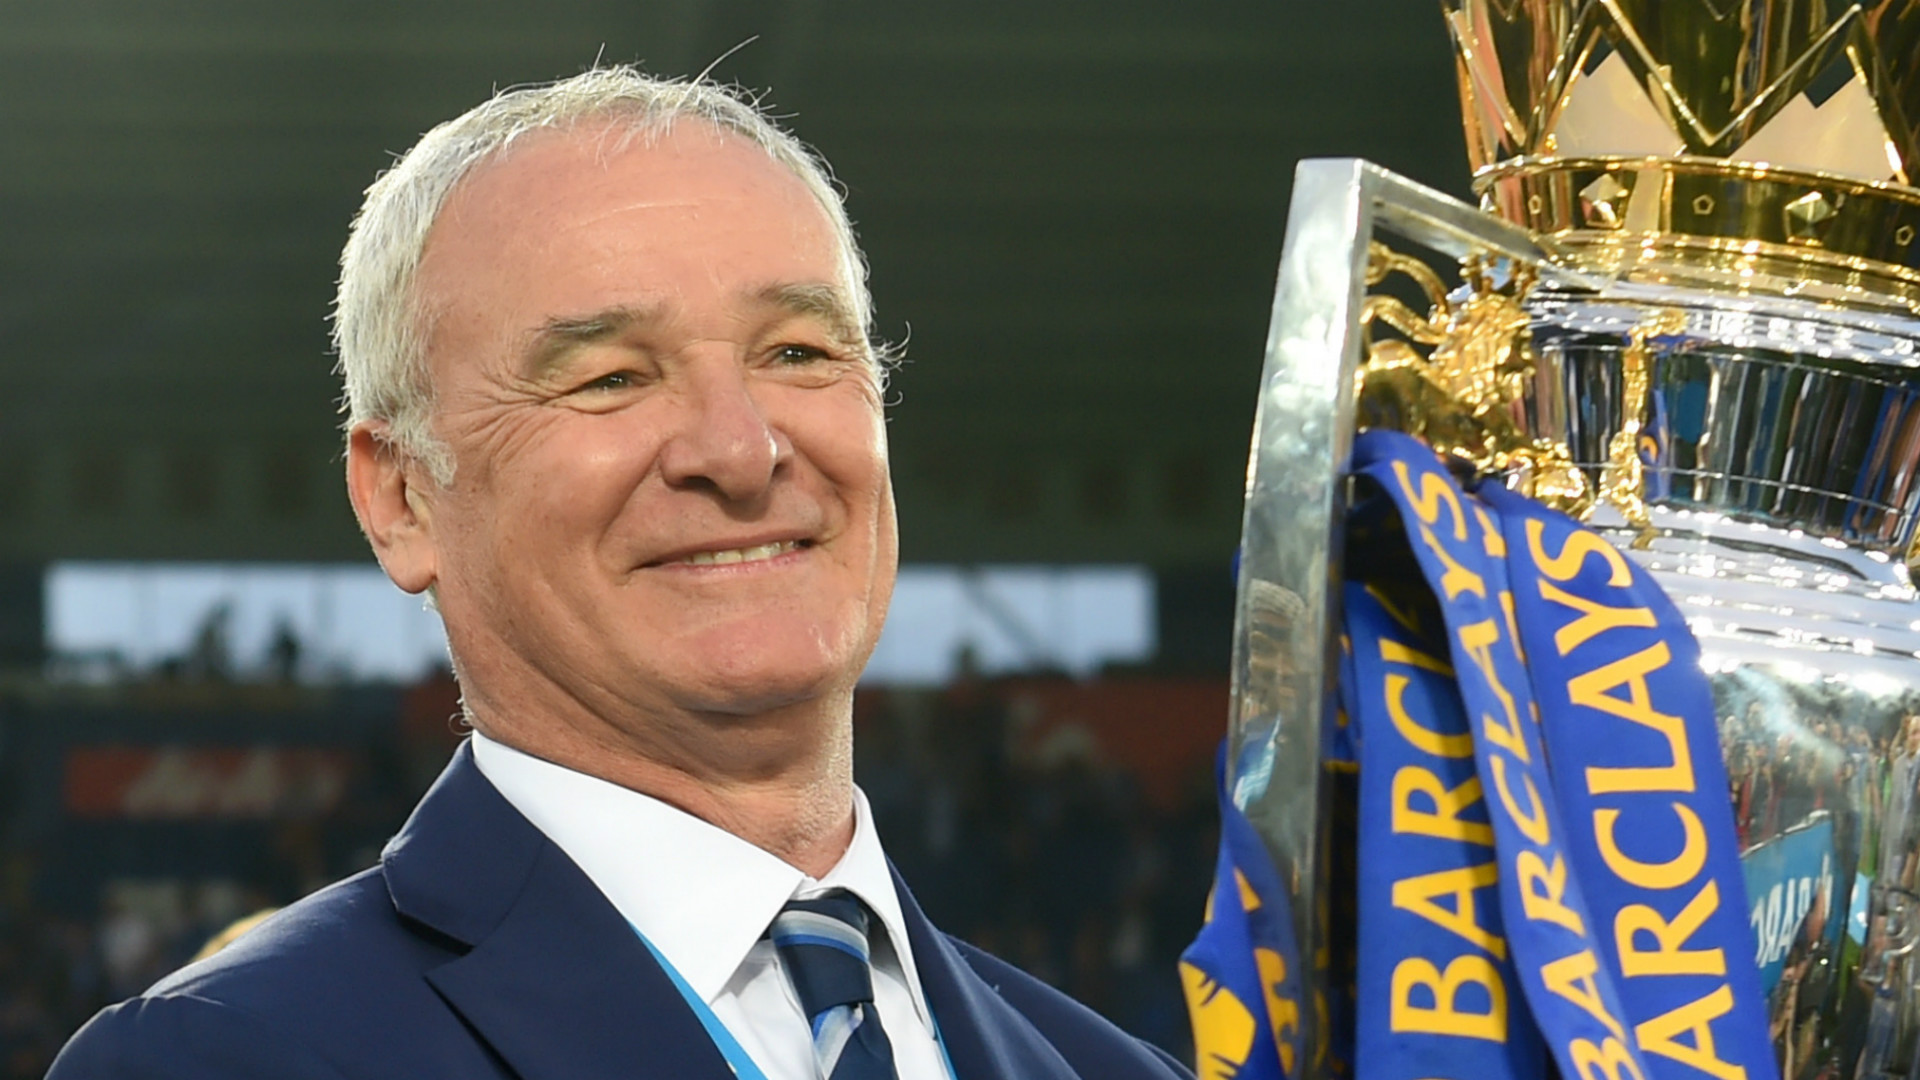 Ranieri, Fernando Santos and Zidane on Federation Internationale de Football Association coach award shortlist